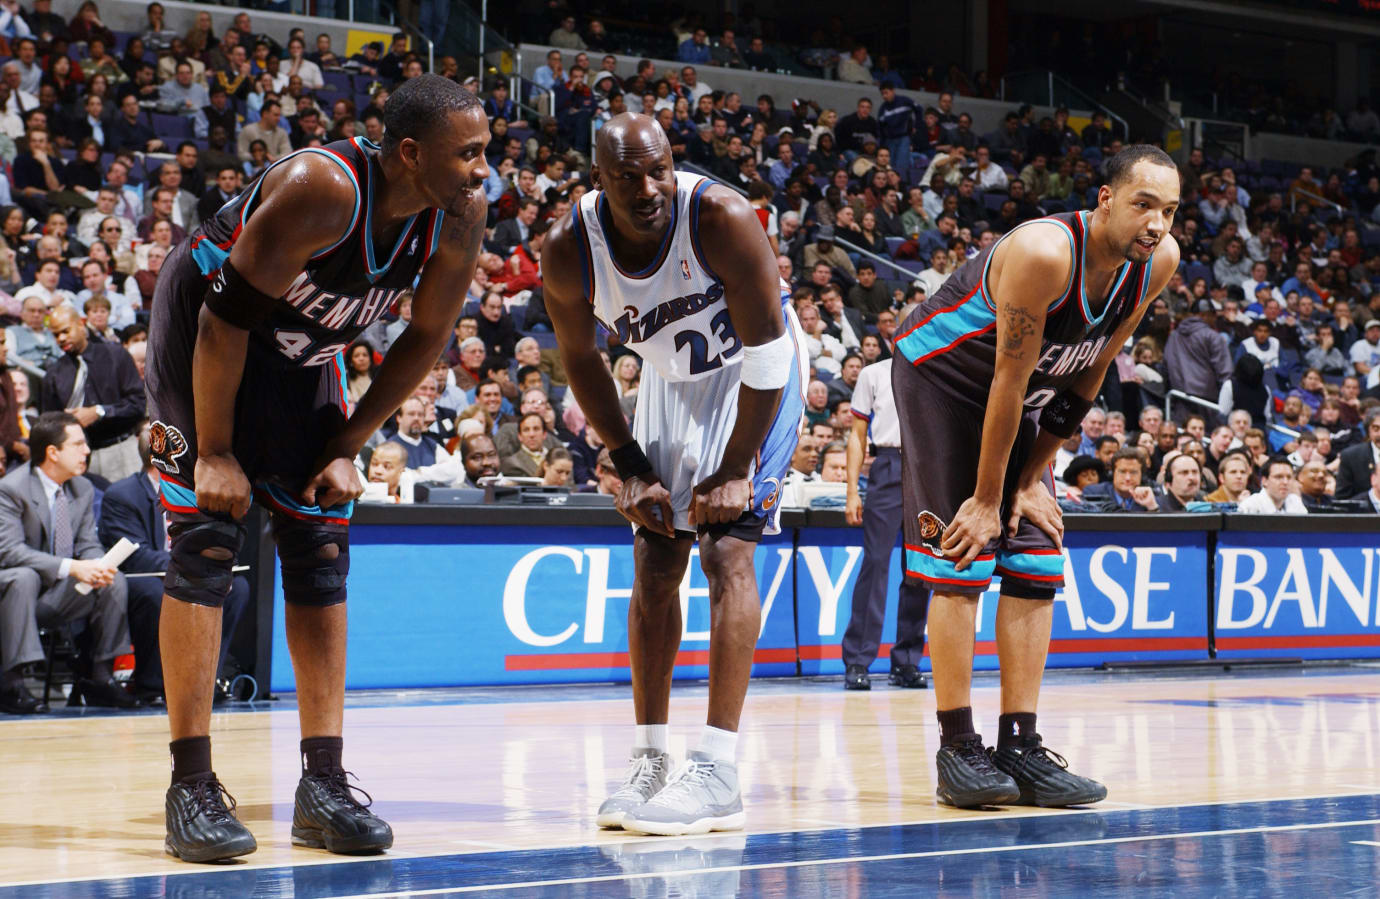 Michael Jordan Washington Wizards vs. Memphis Grizzlies